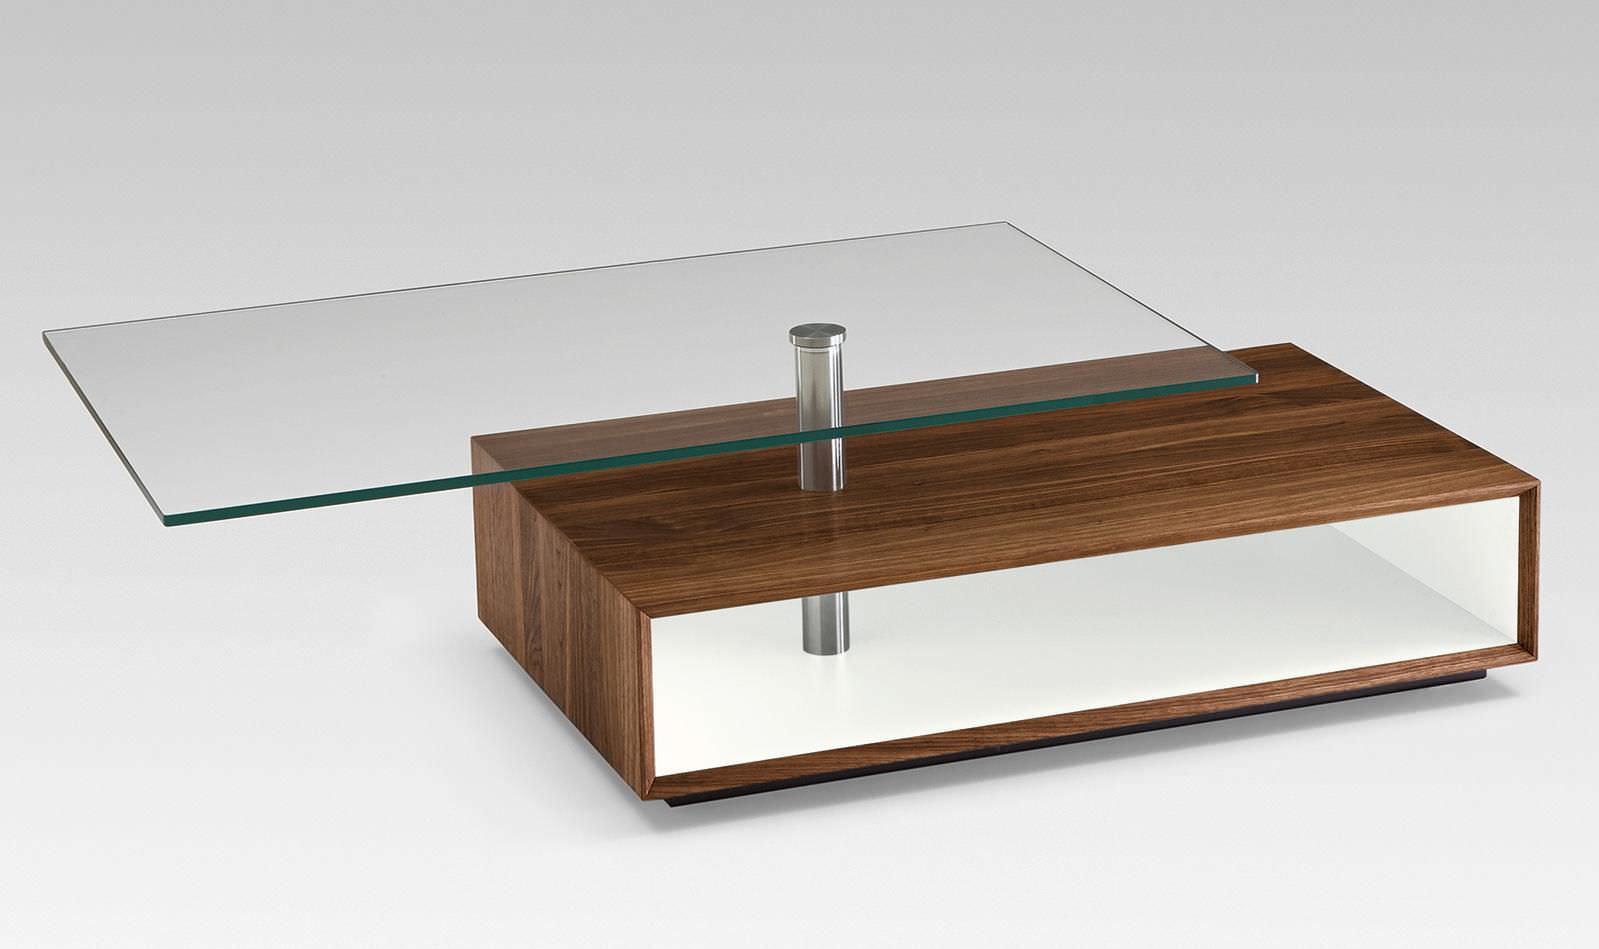 Moderner Couchtisch Holz Glas Rechteckig 4087 Alfons